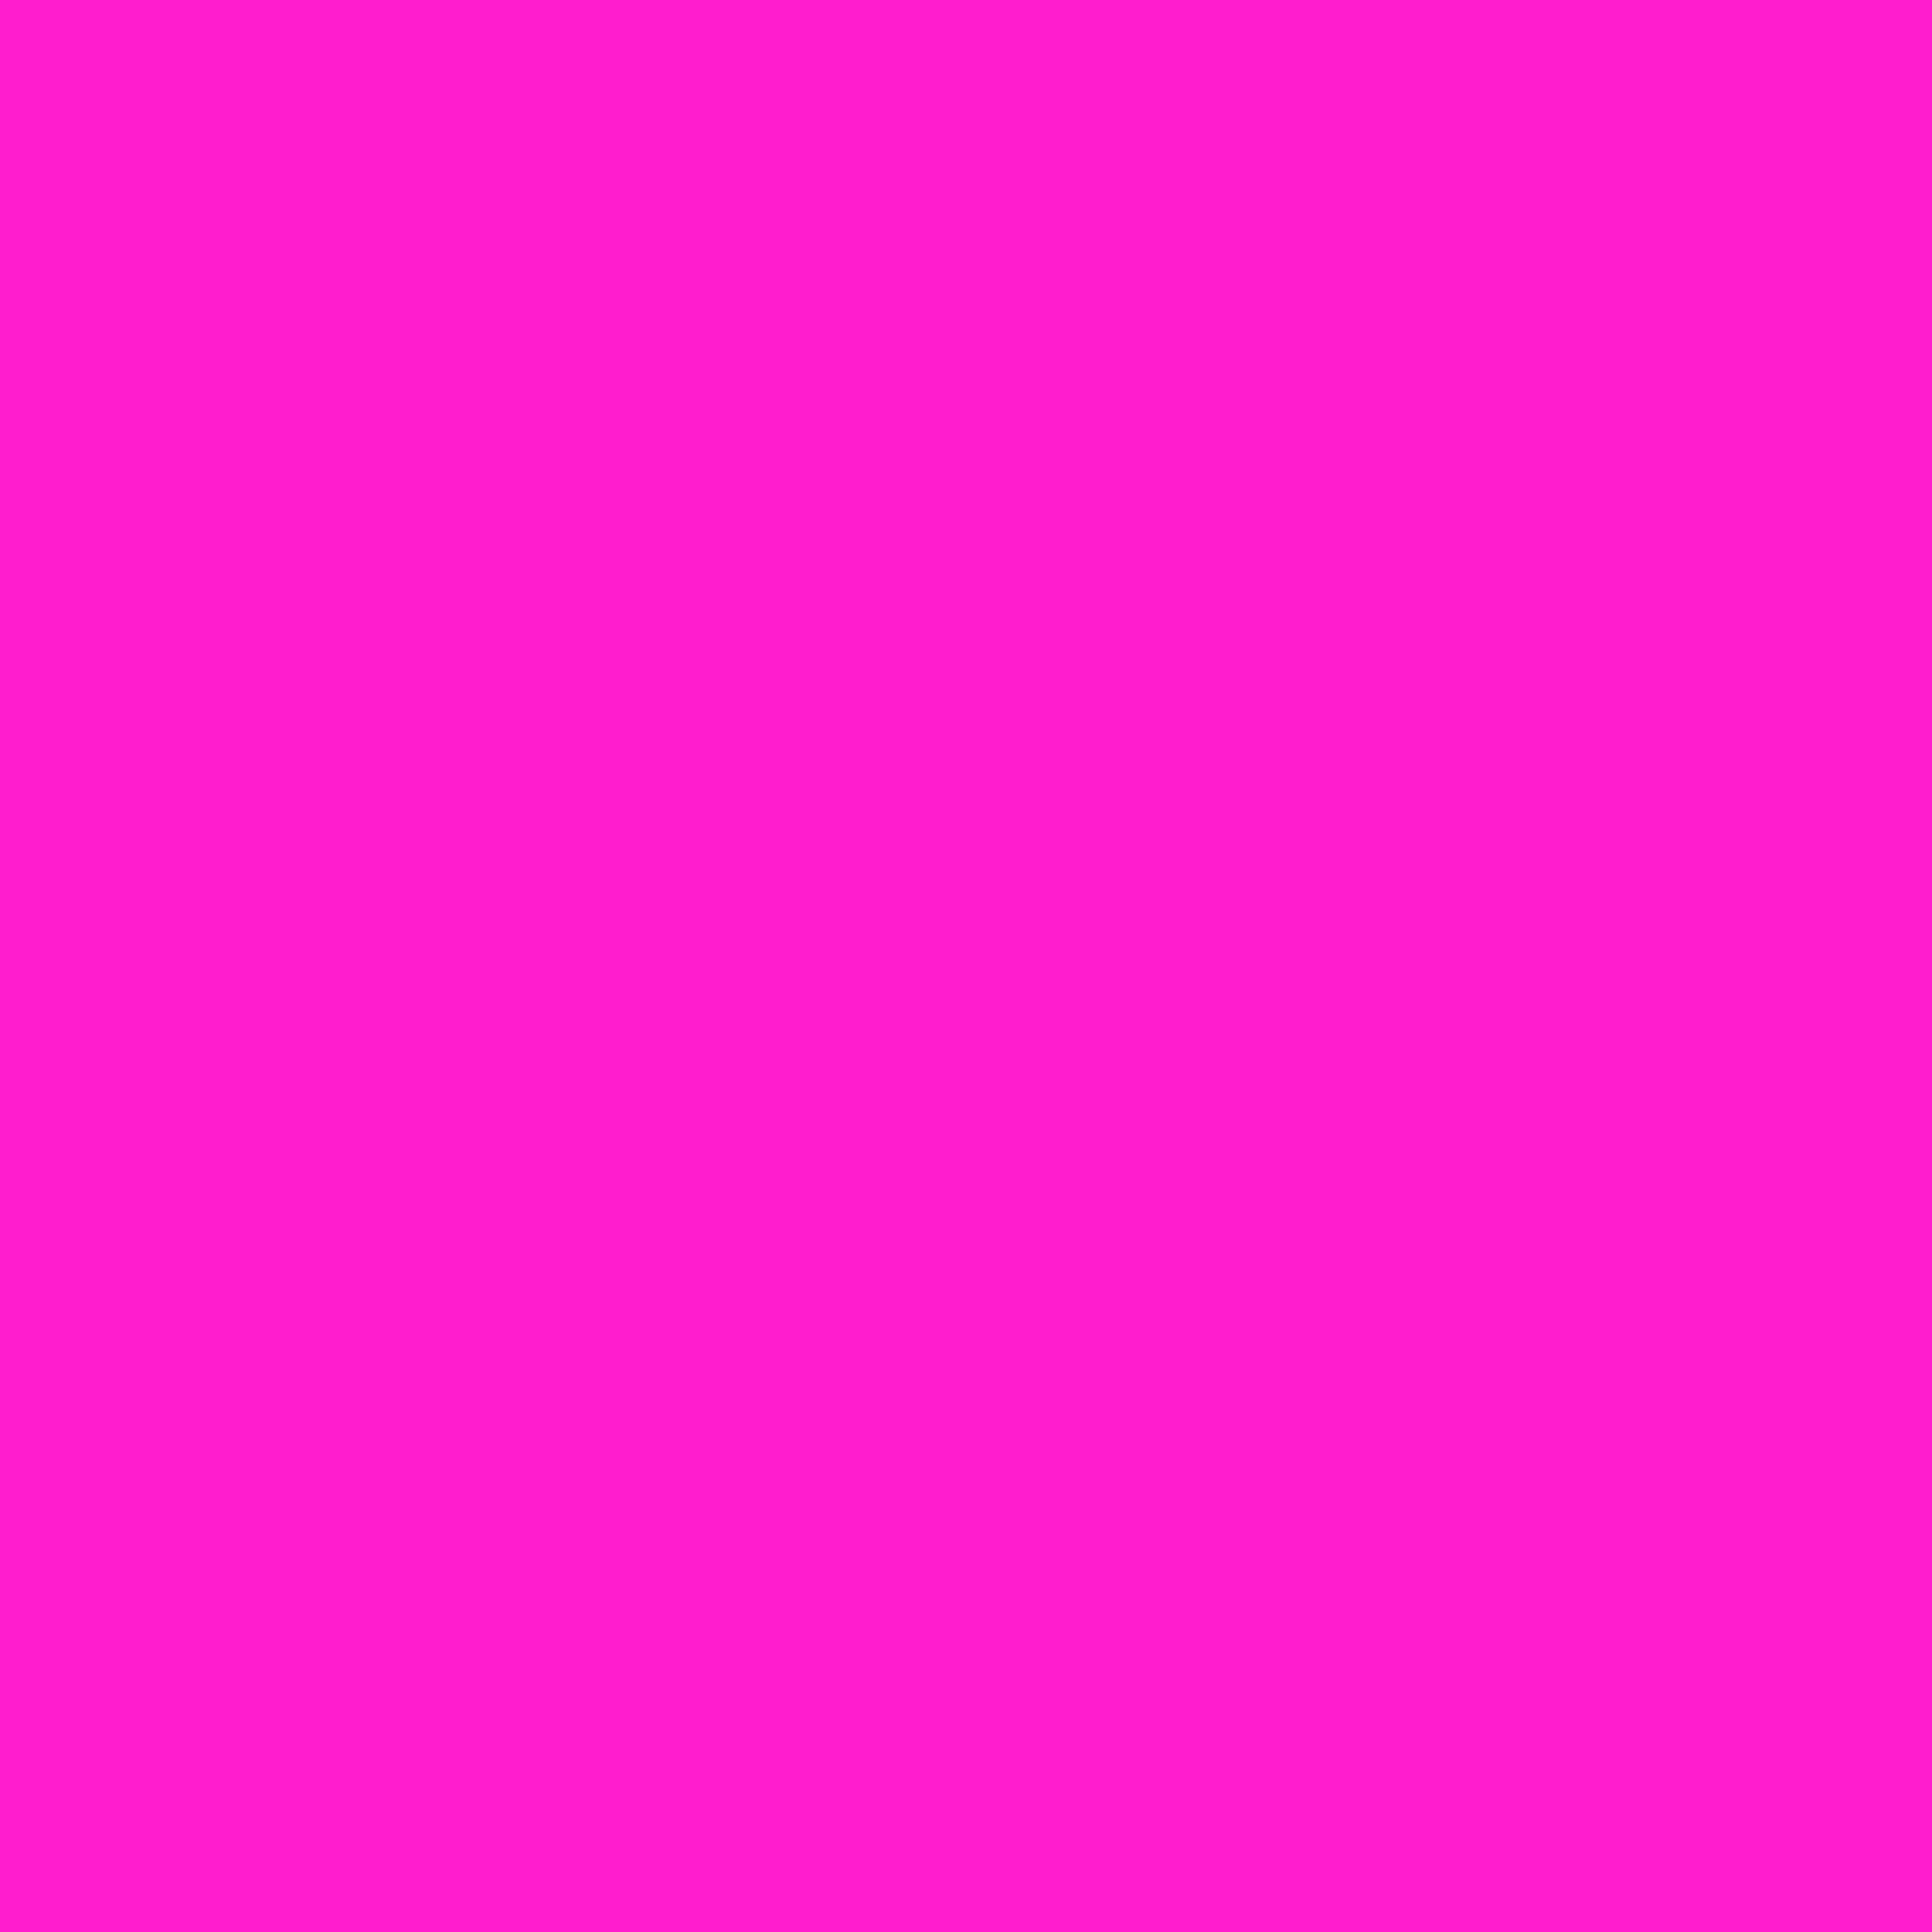 2732x2732 Hot Magenta Solid Color Background